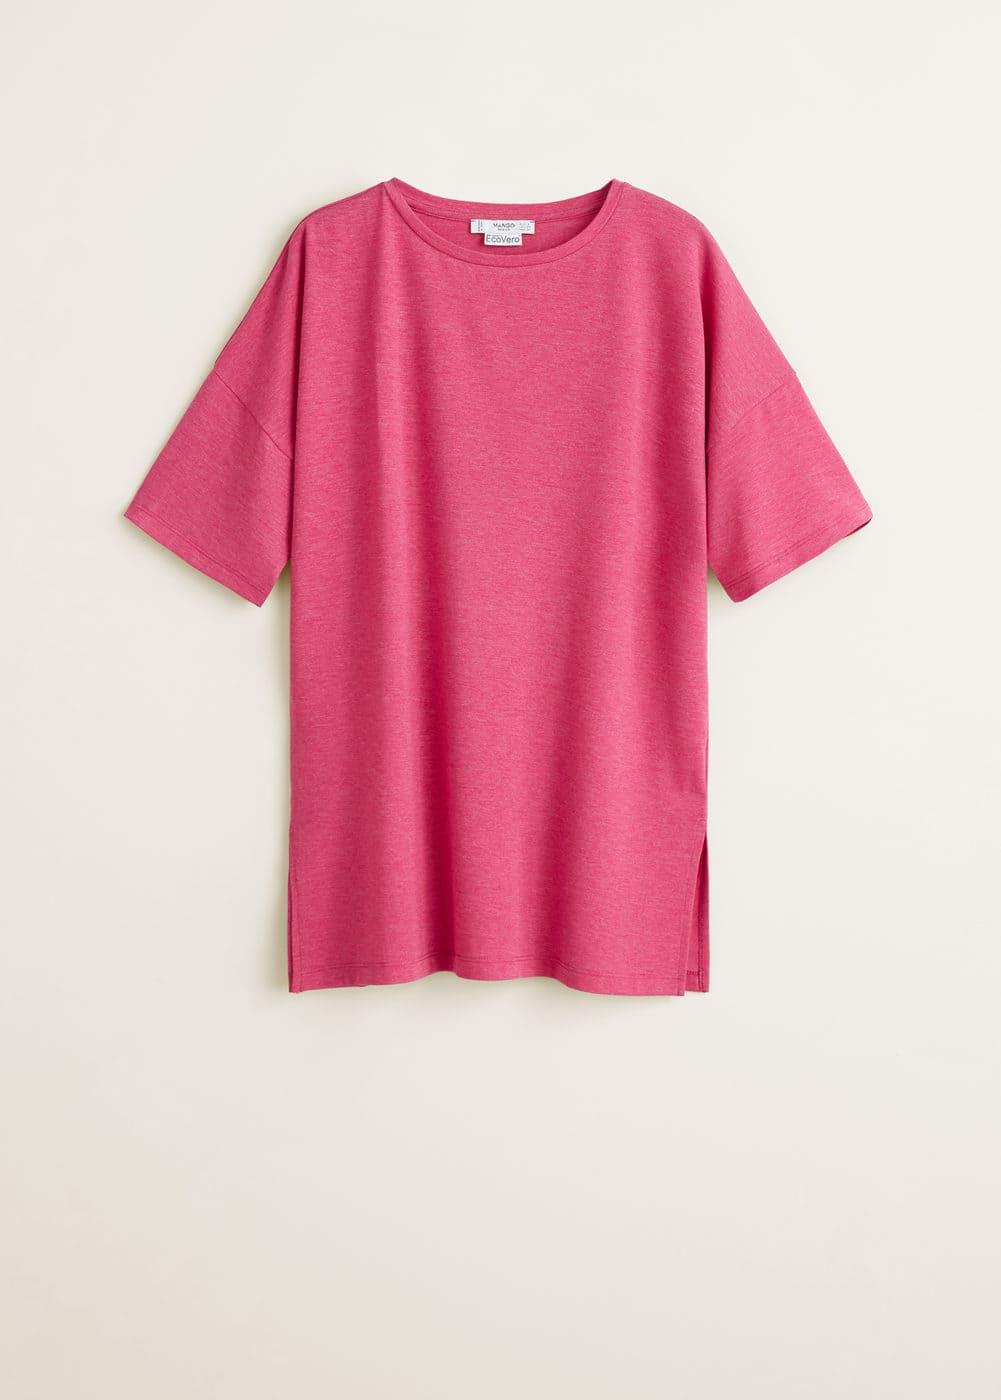 Mango - Basic t-shirt - 6